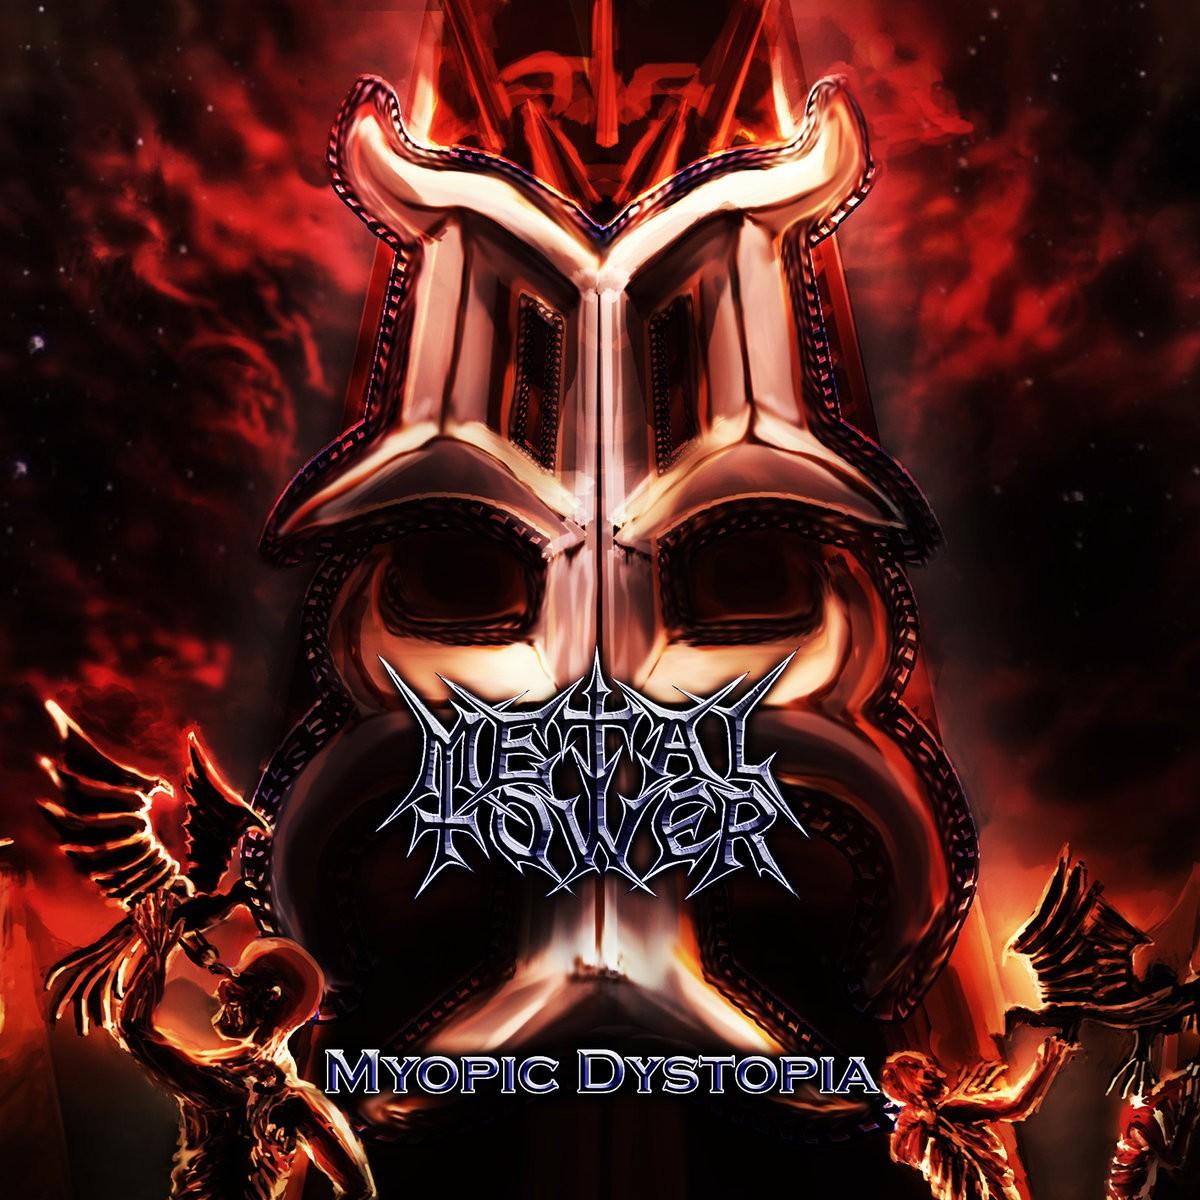 metaltower-myopic-dystopia